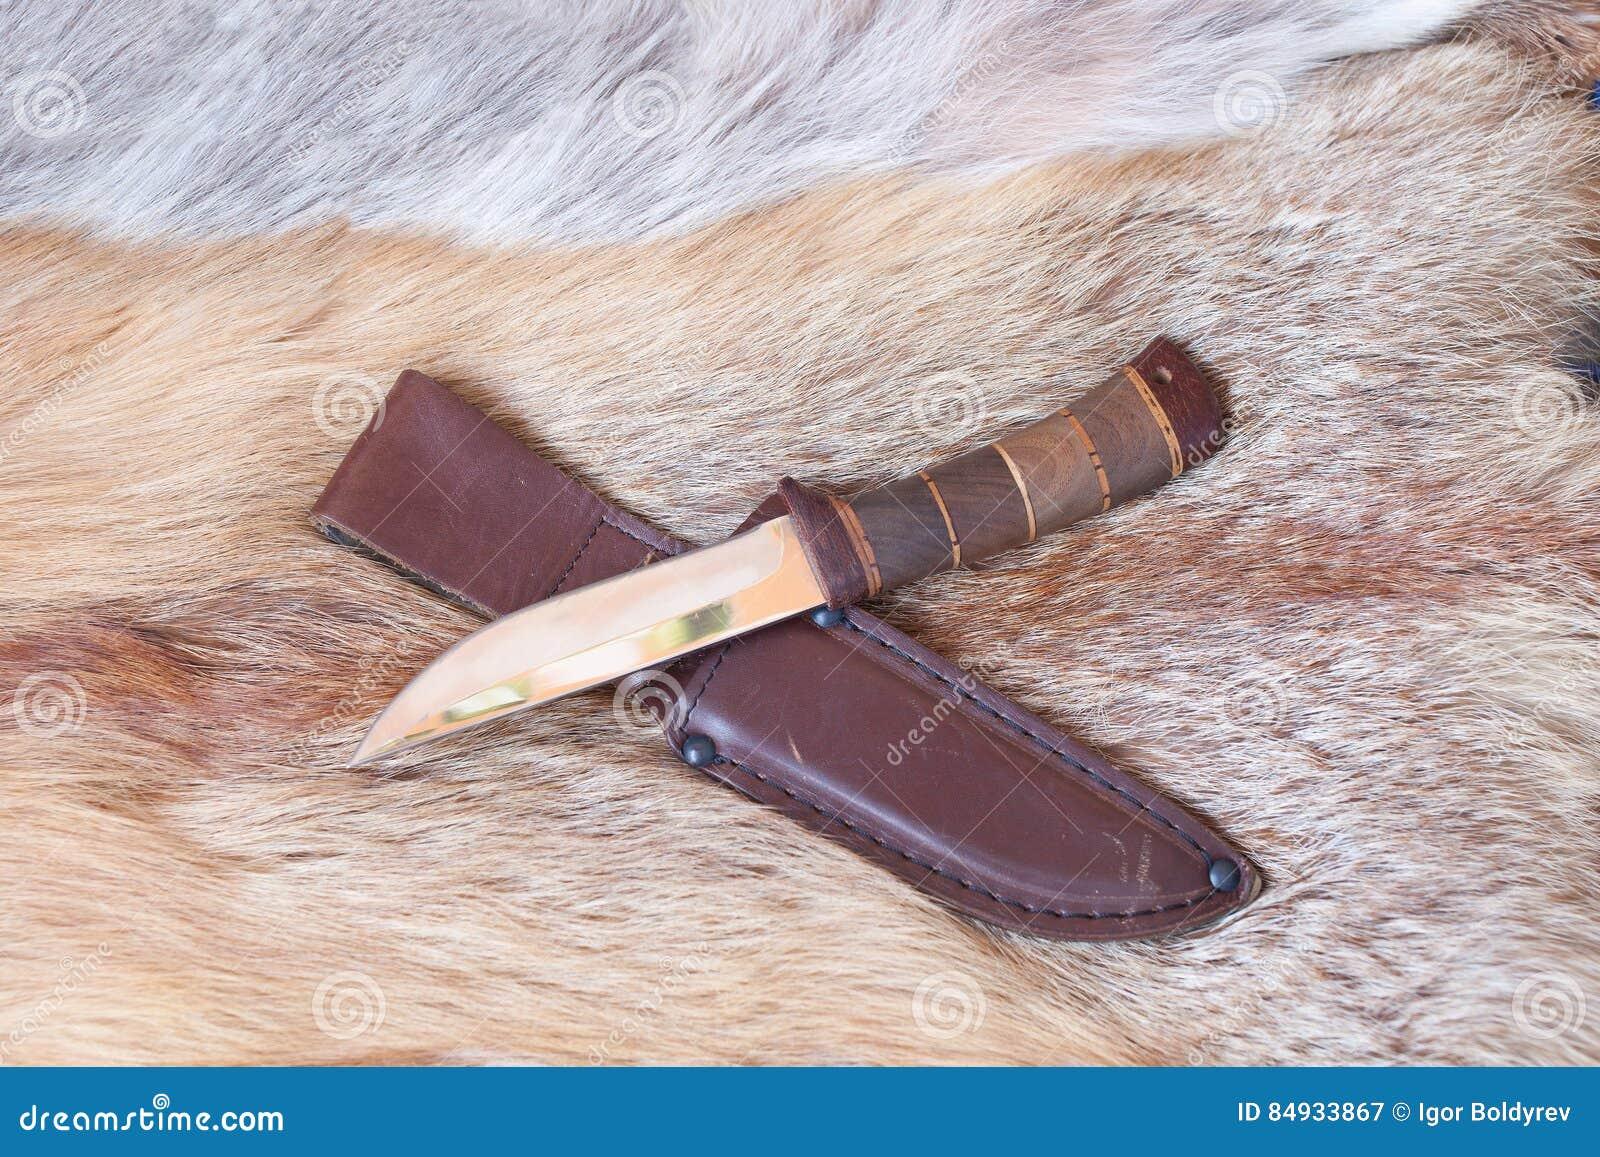 Sharp hunting knife